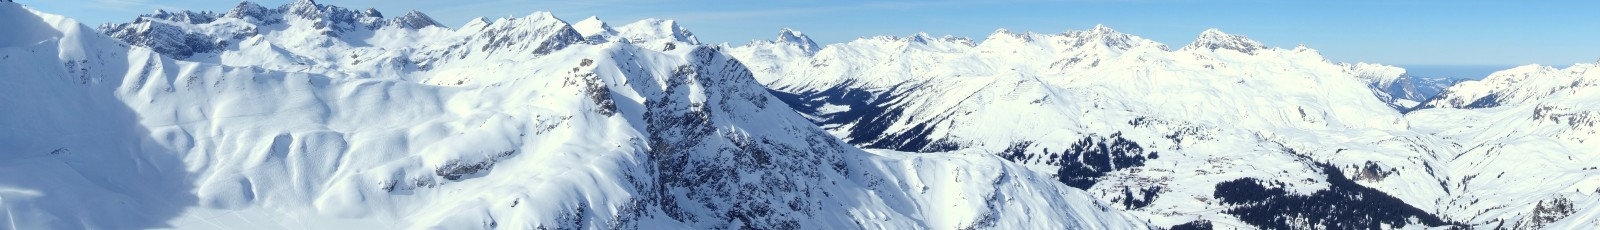 Skischule-Lech Blog